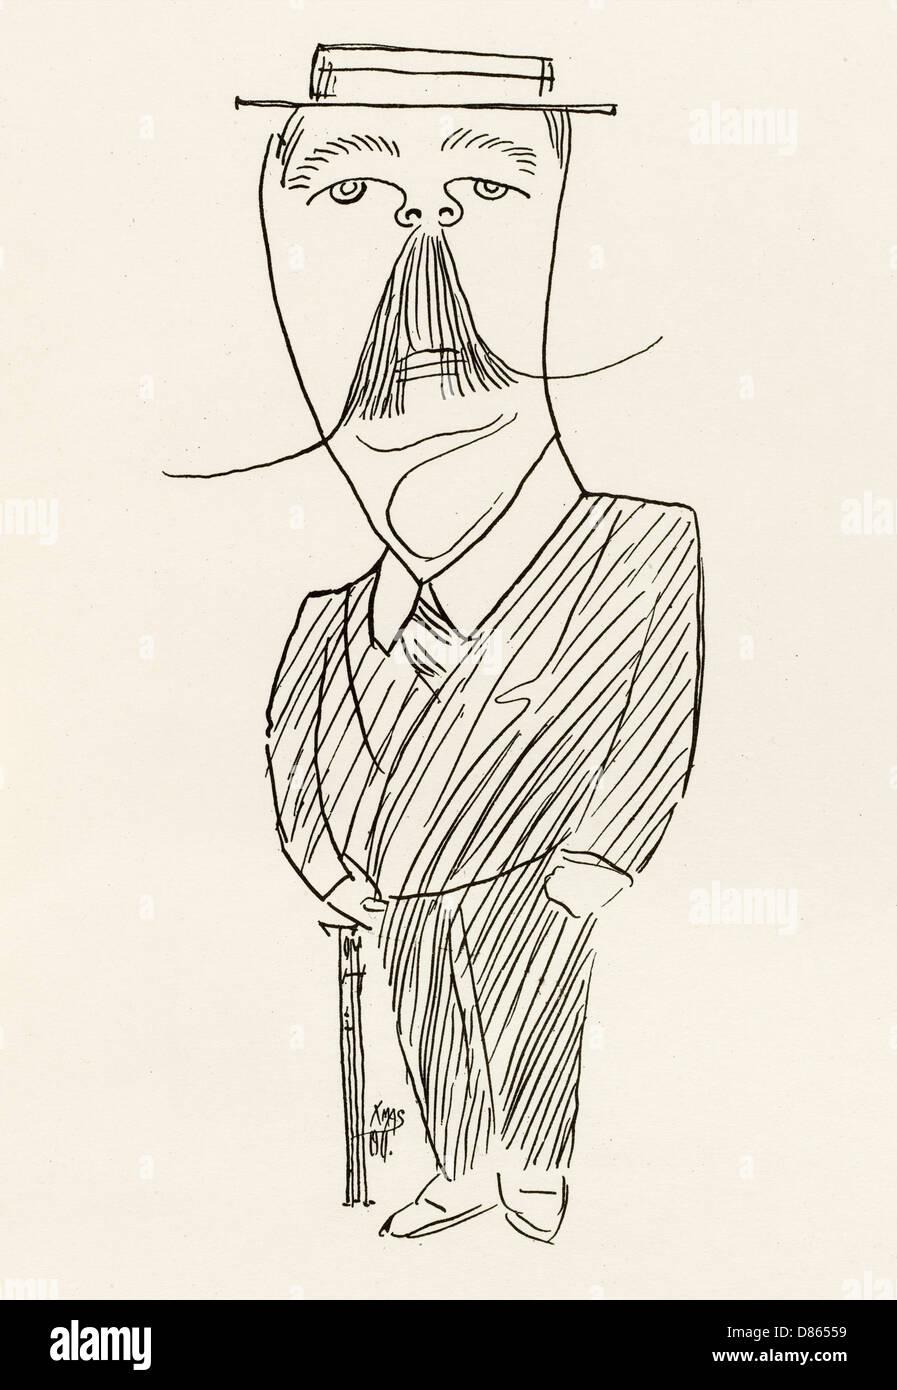 Sir Arthur Conan Doyle  Writer - Stock Image